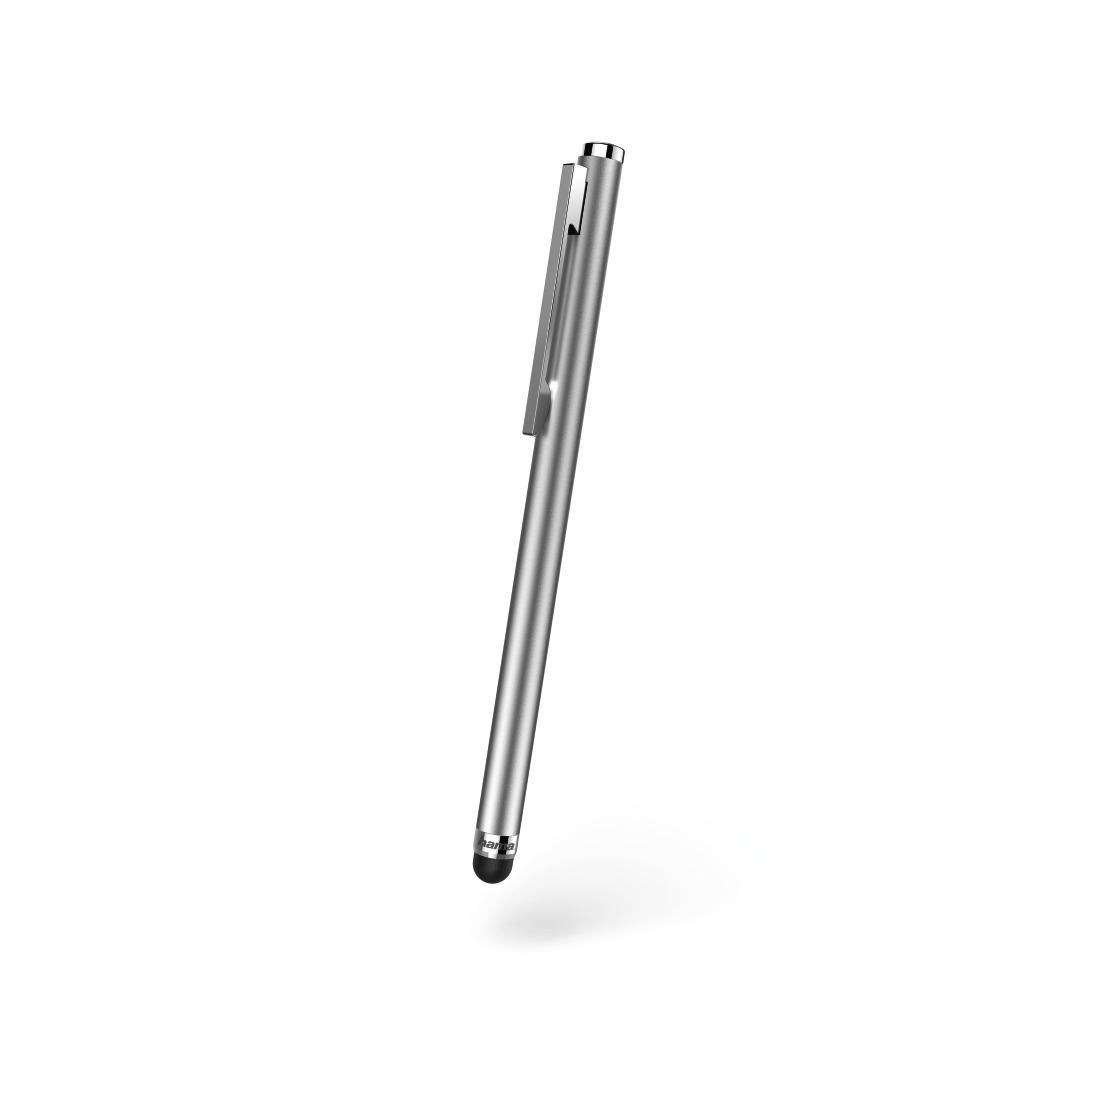 Korting Hama STYLUS SLIM ZI stylus pen